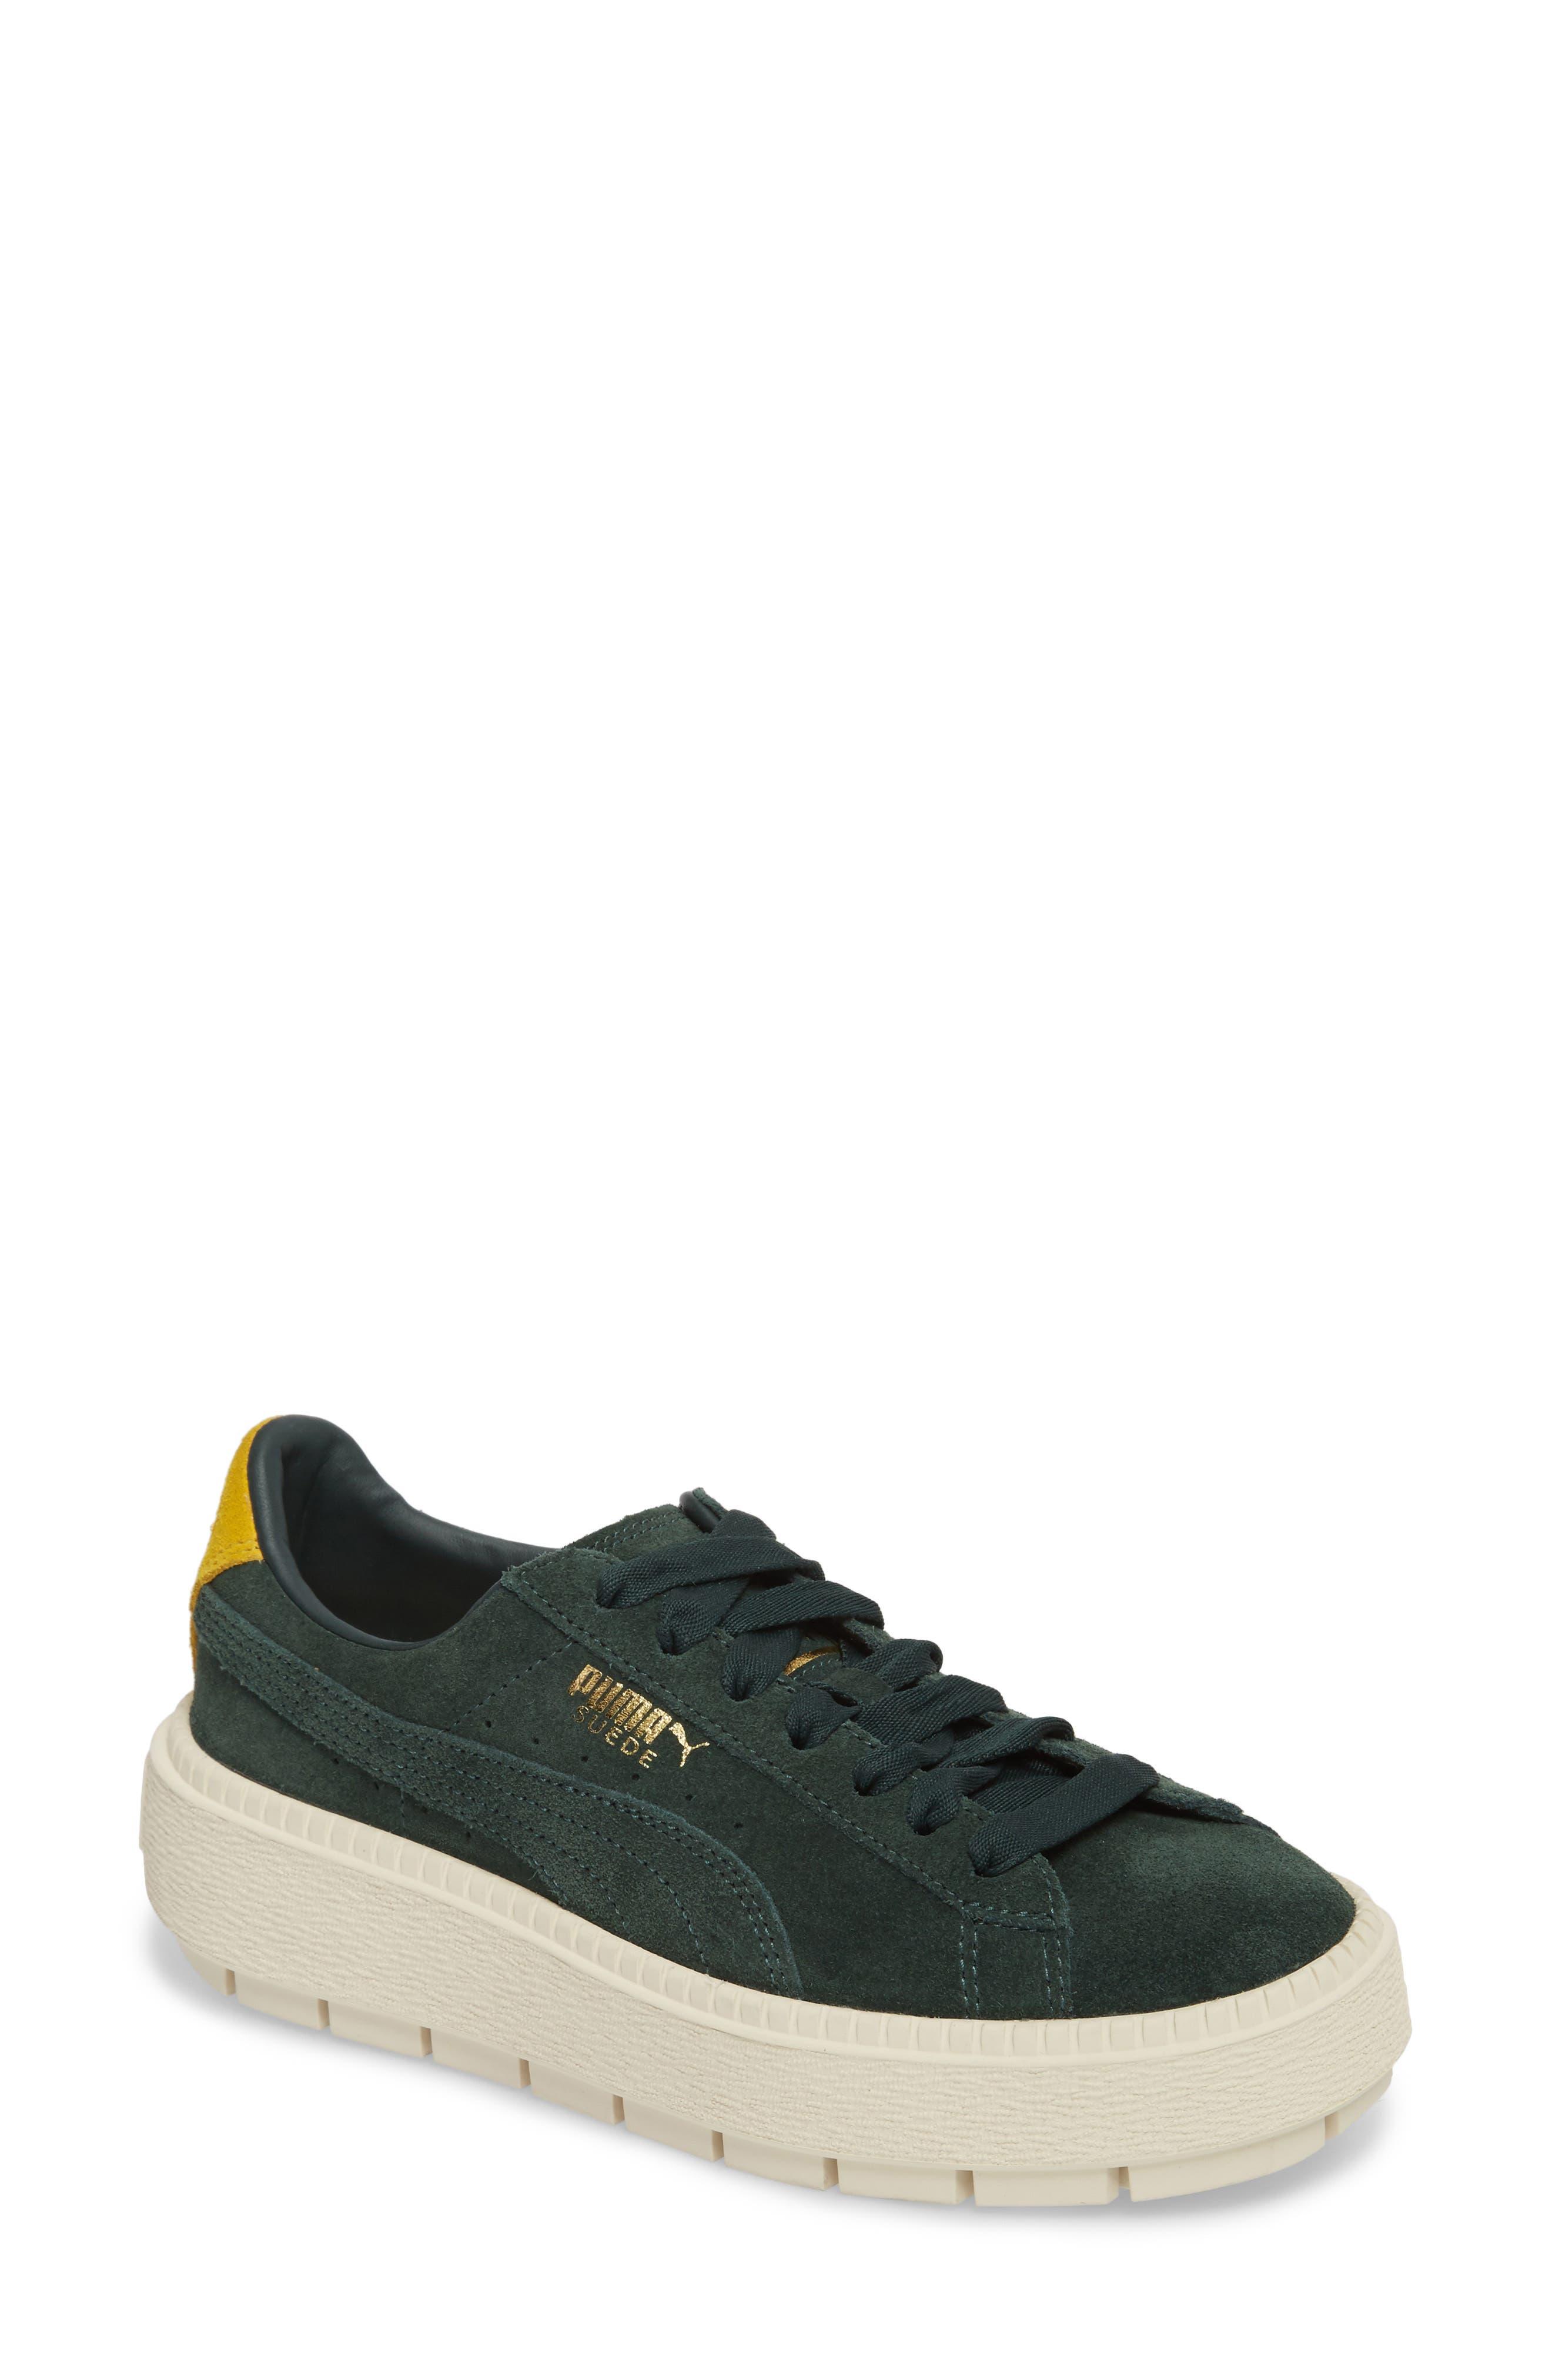 Platform Trace Bold Sneaker,                         Main,                         color, Scrab-Lemon -Vanilla Ice